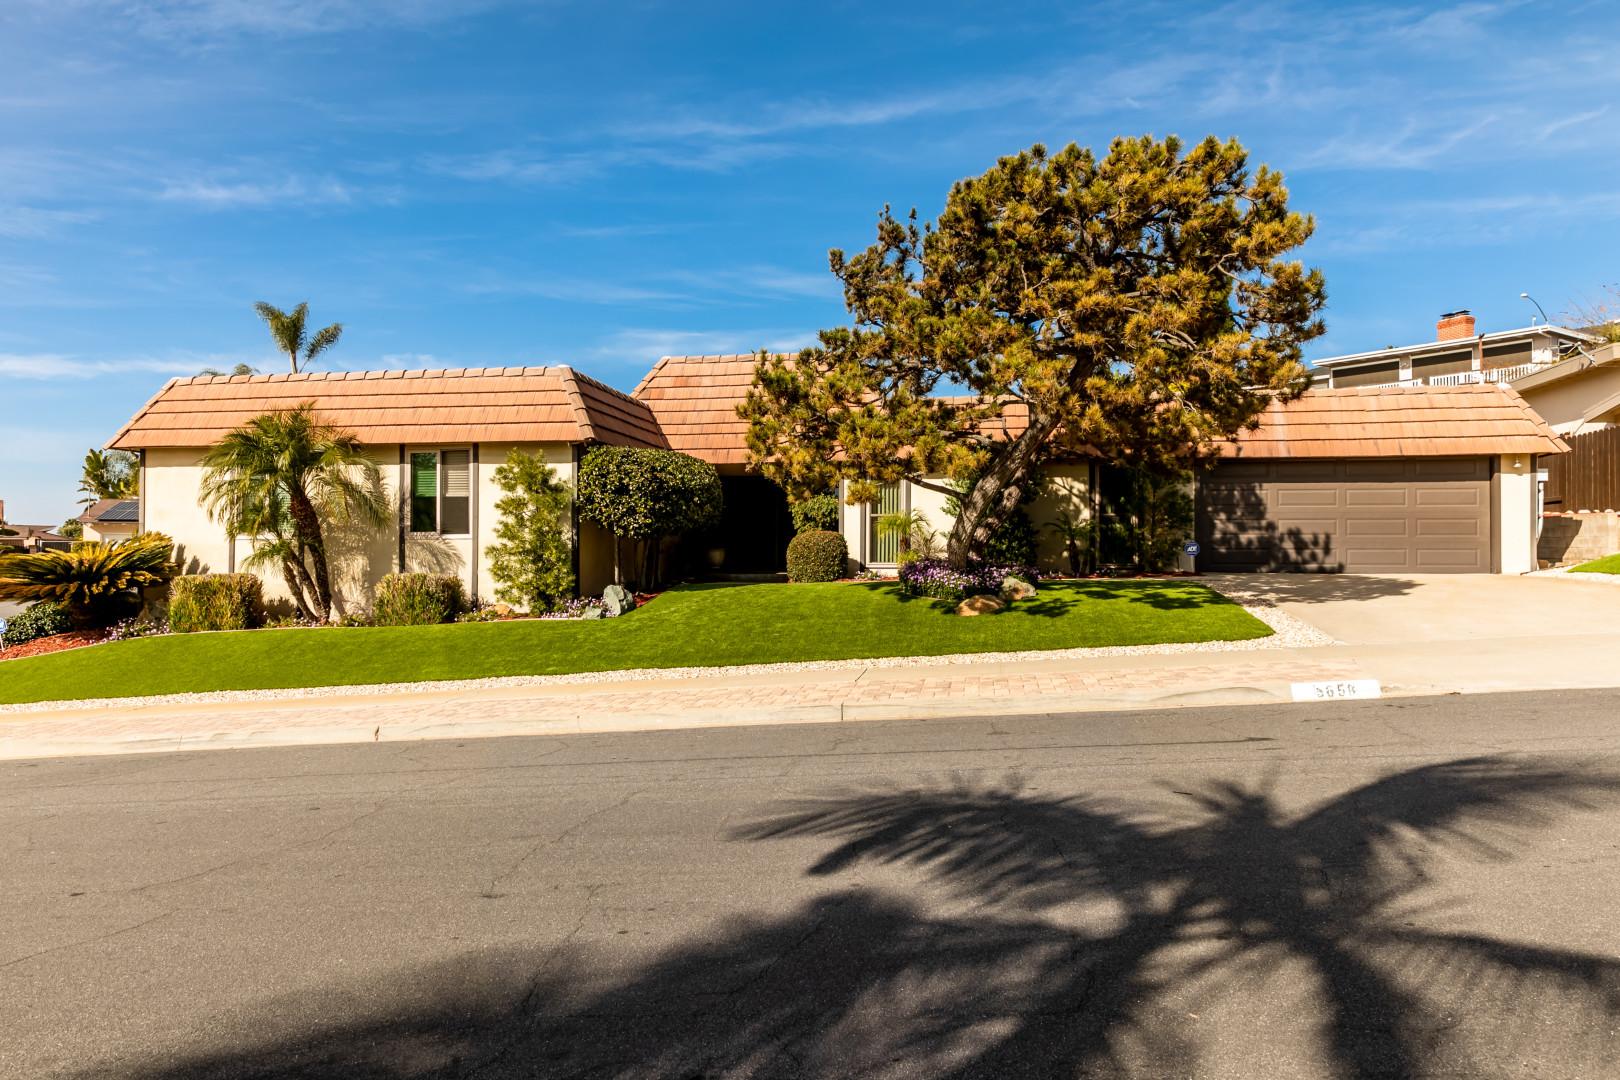 5658 Linfield Ave, San Diego, California 92120